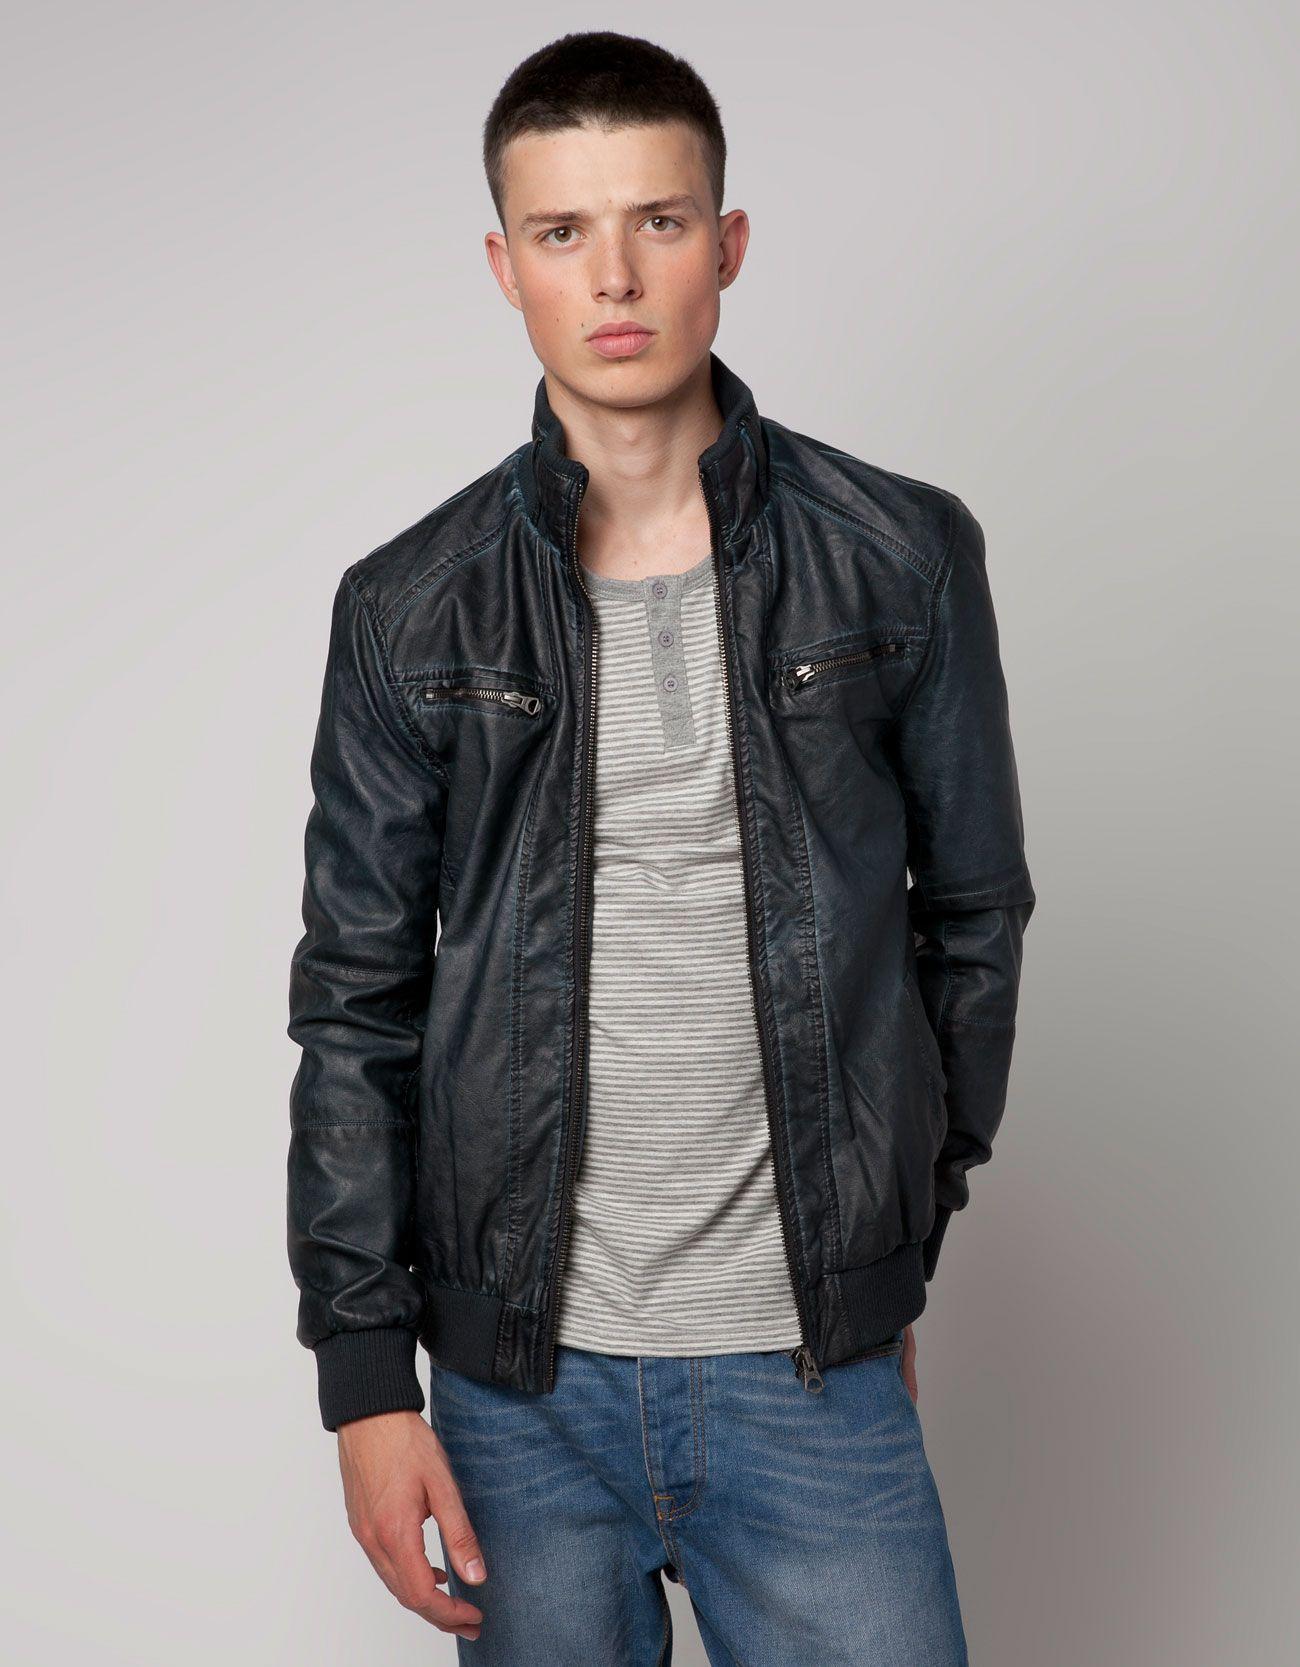 Bershka Hong Kong S. of China - Imitation leather biker jacket